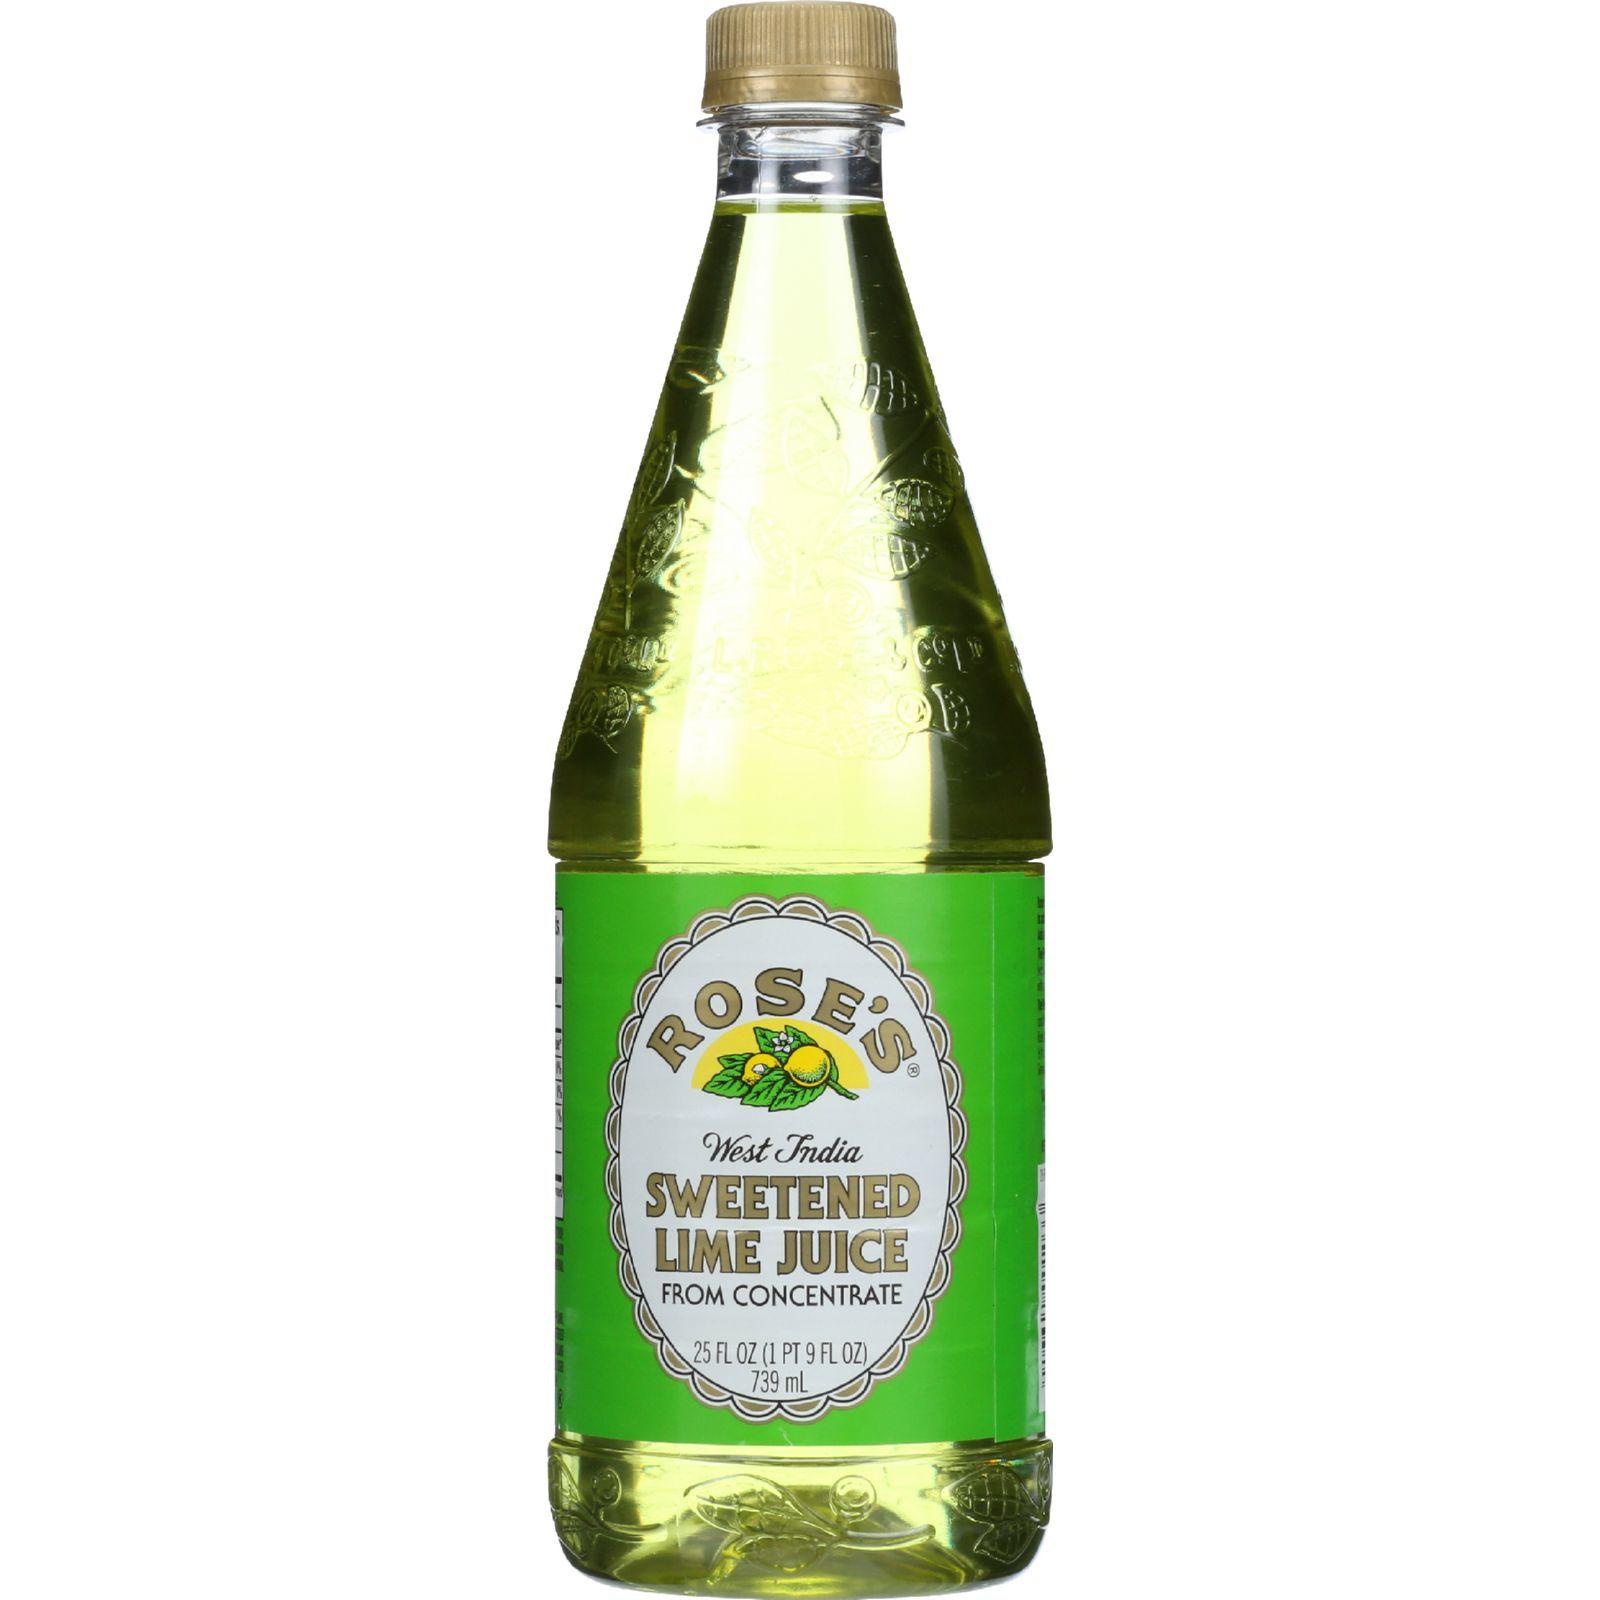 Roses Juice - Sweetened Lime - 25 oz - 1 each